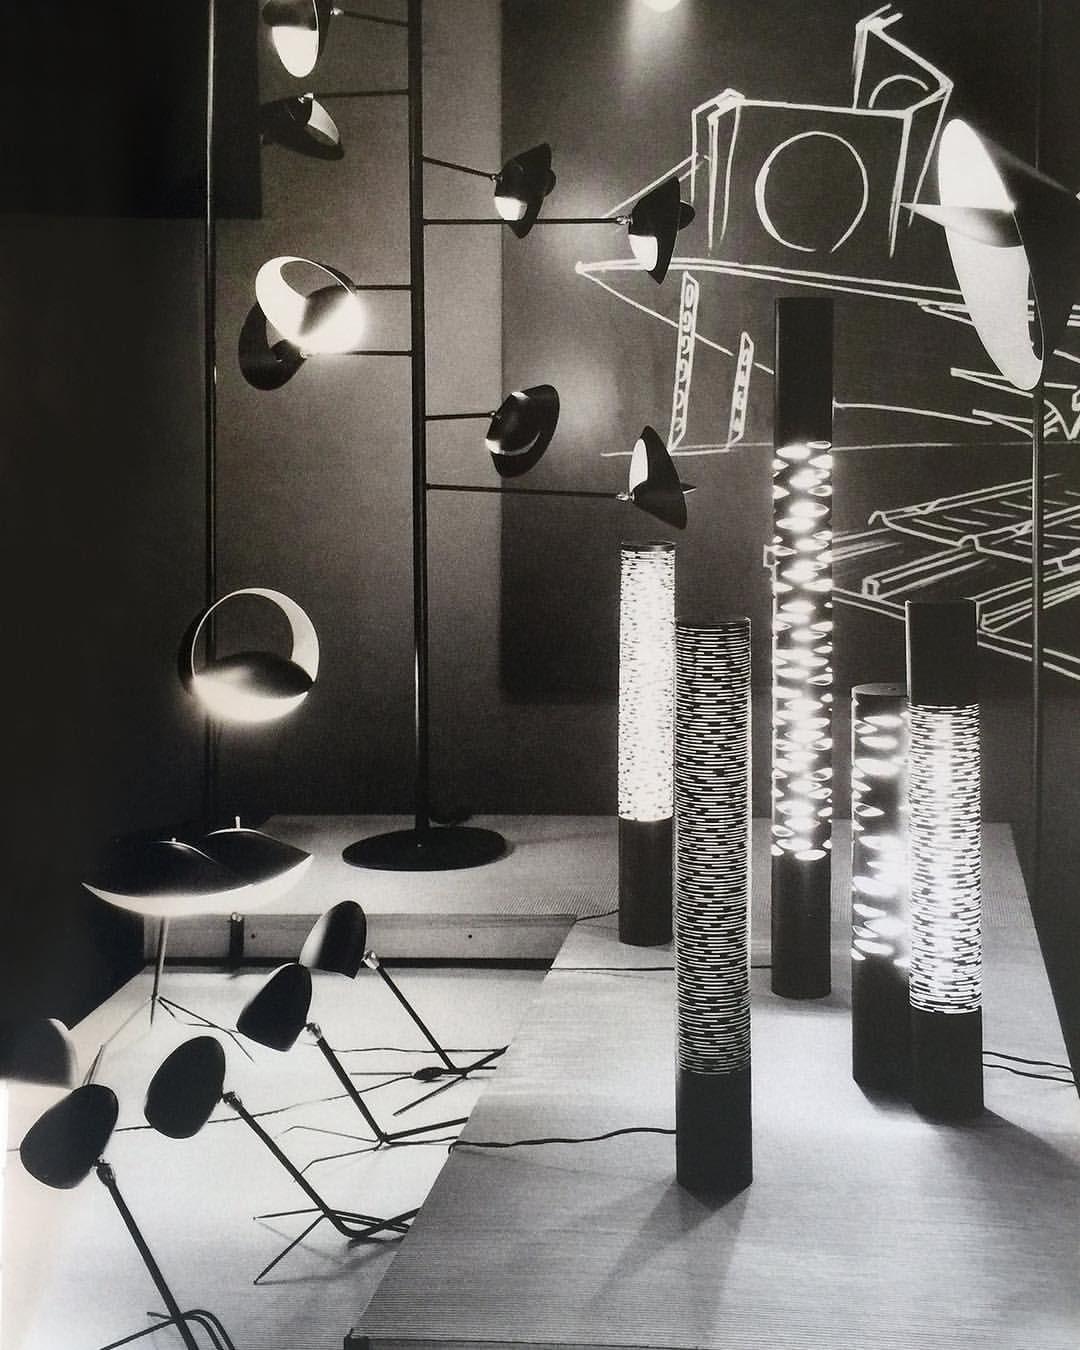 Dc Hillier A 1957 Promotional Image By Galerie Steph Simon Showcasing Lighting By Designer Serge Mouille In 2020 Graphik Skulpturen Malerei